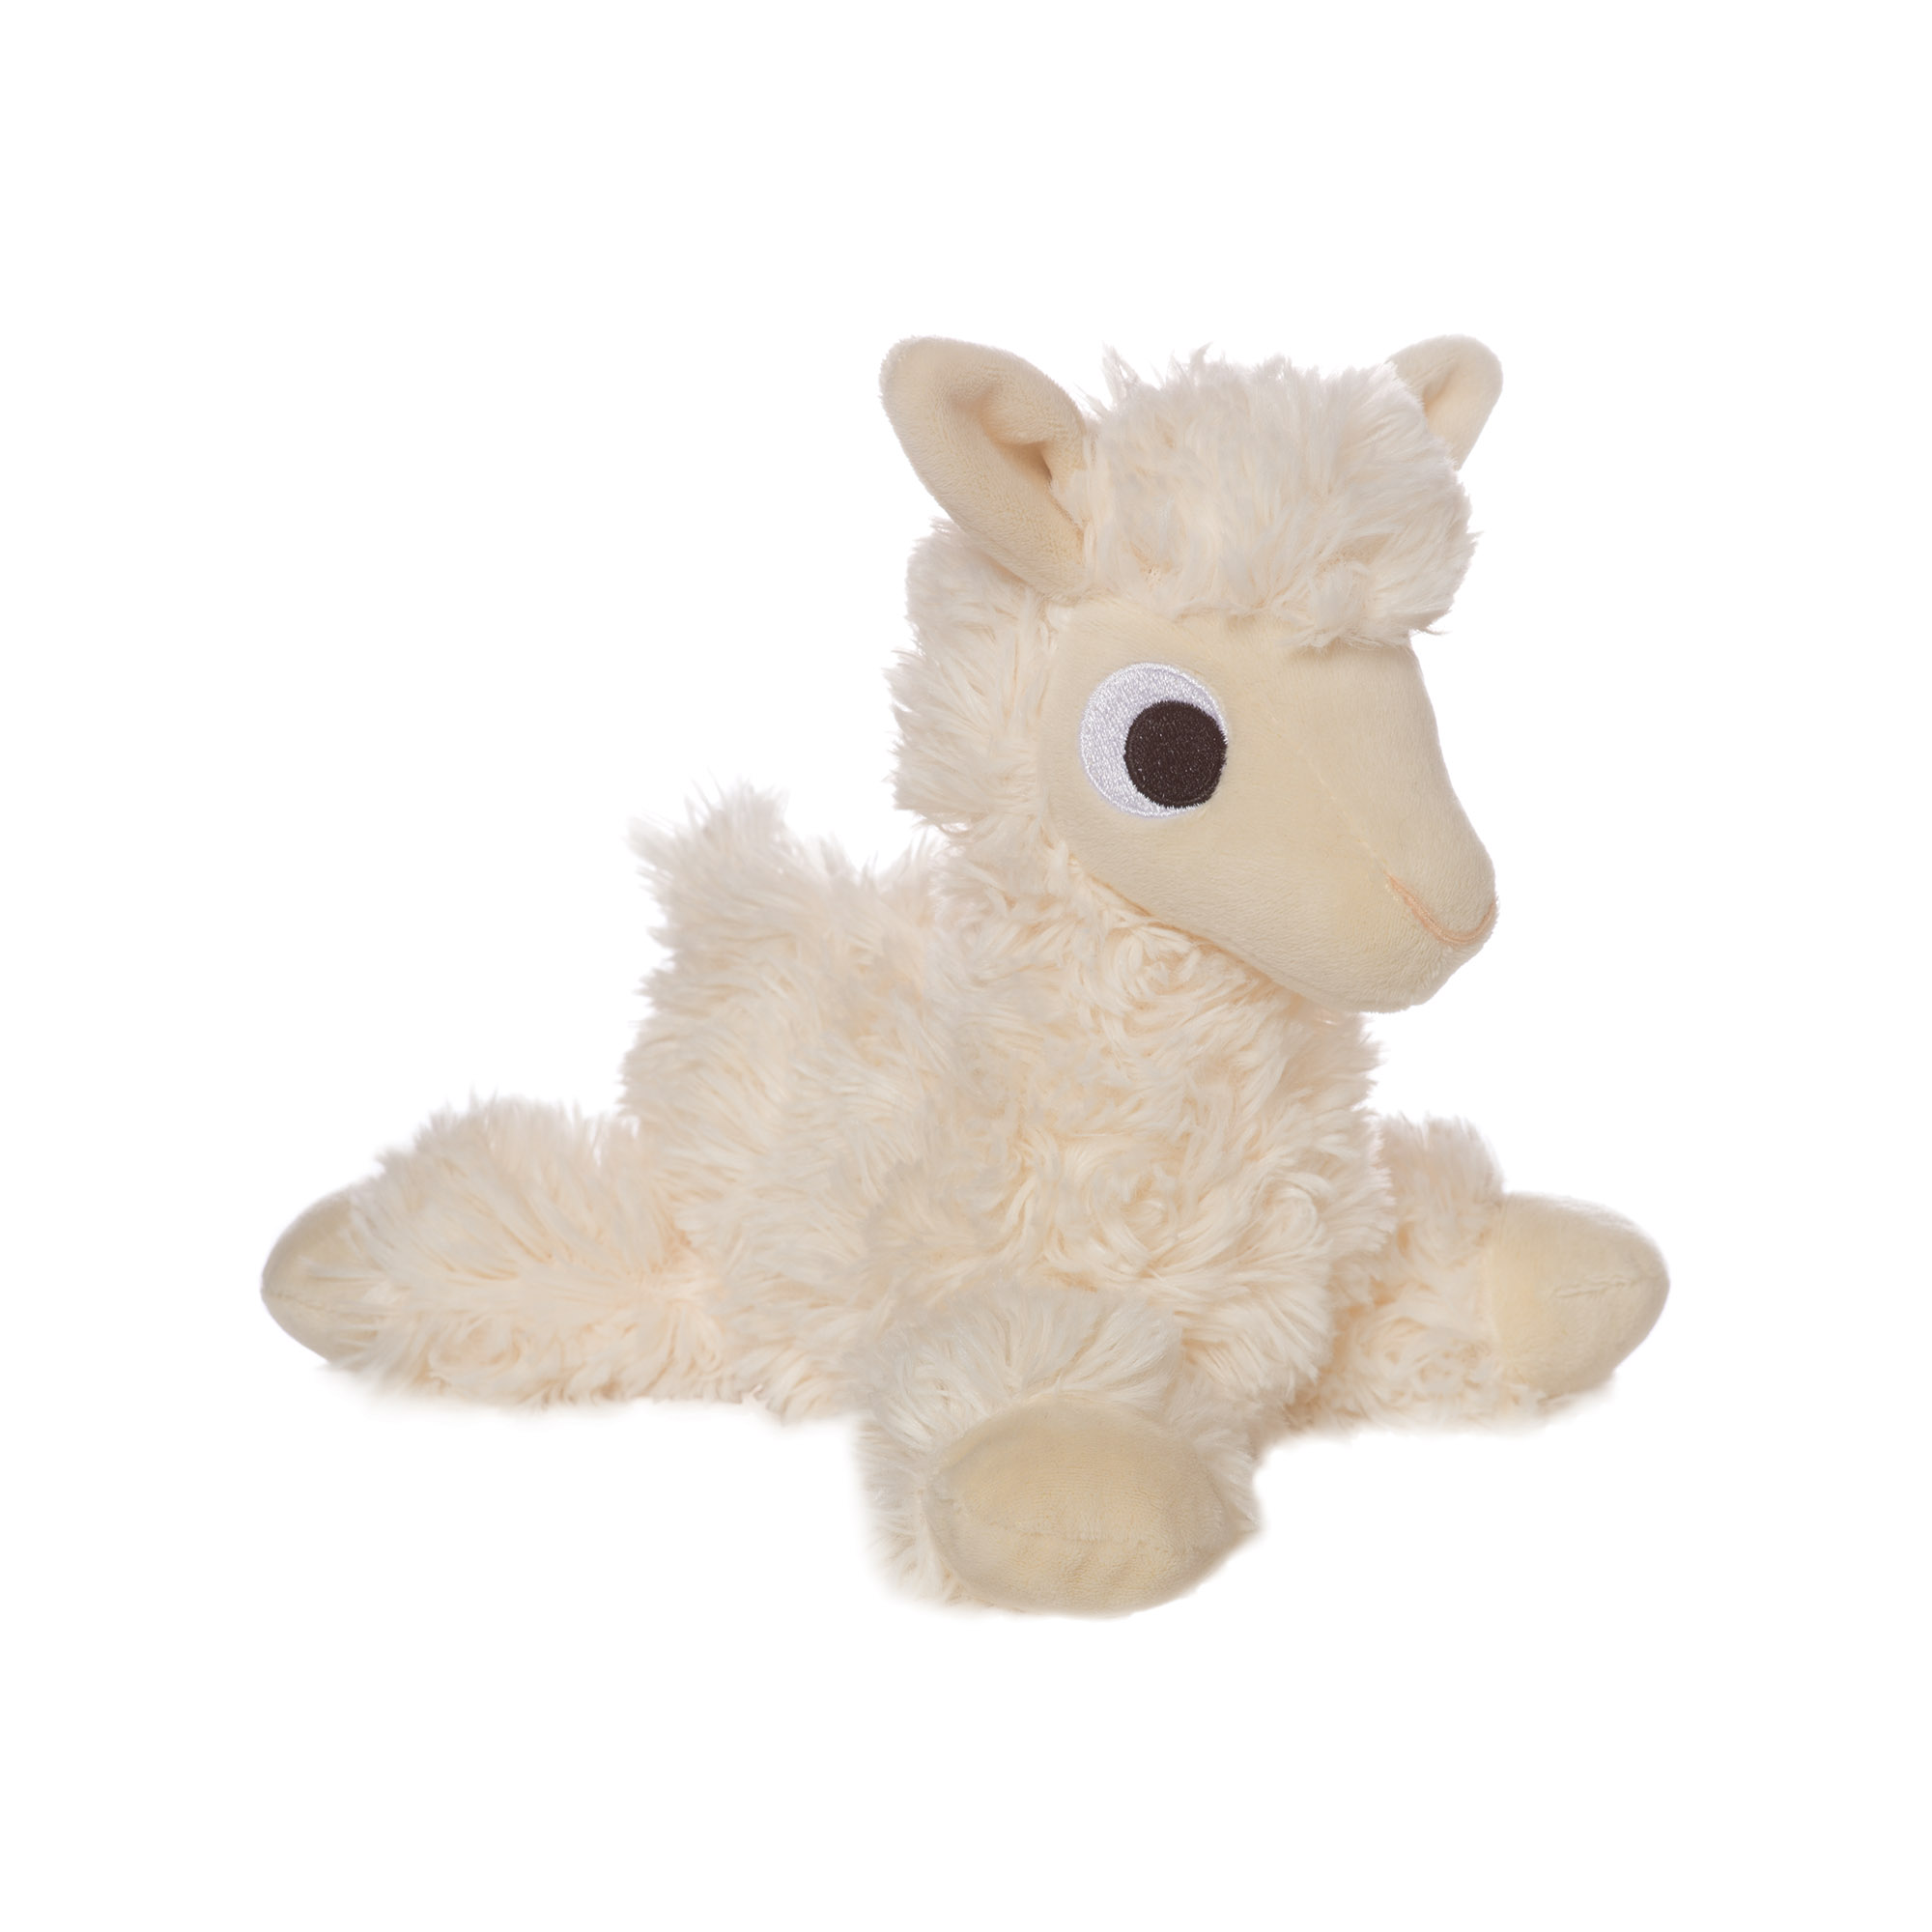 Manhattan Toy Floppies 7 Baby Llama Plush Toy Walmart Com